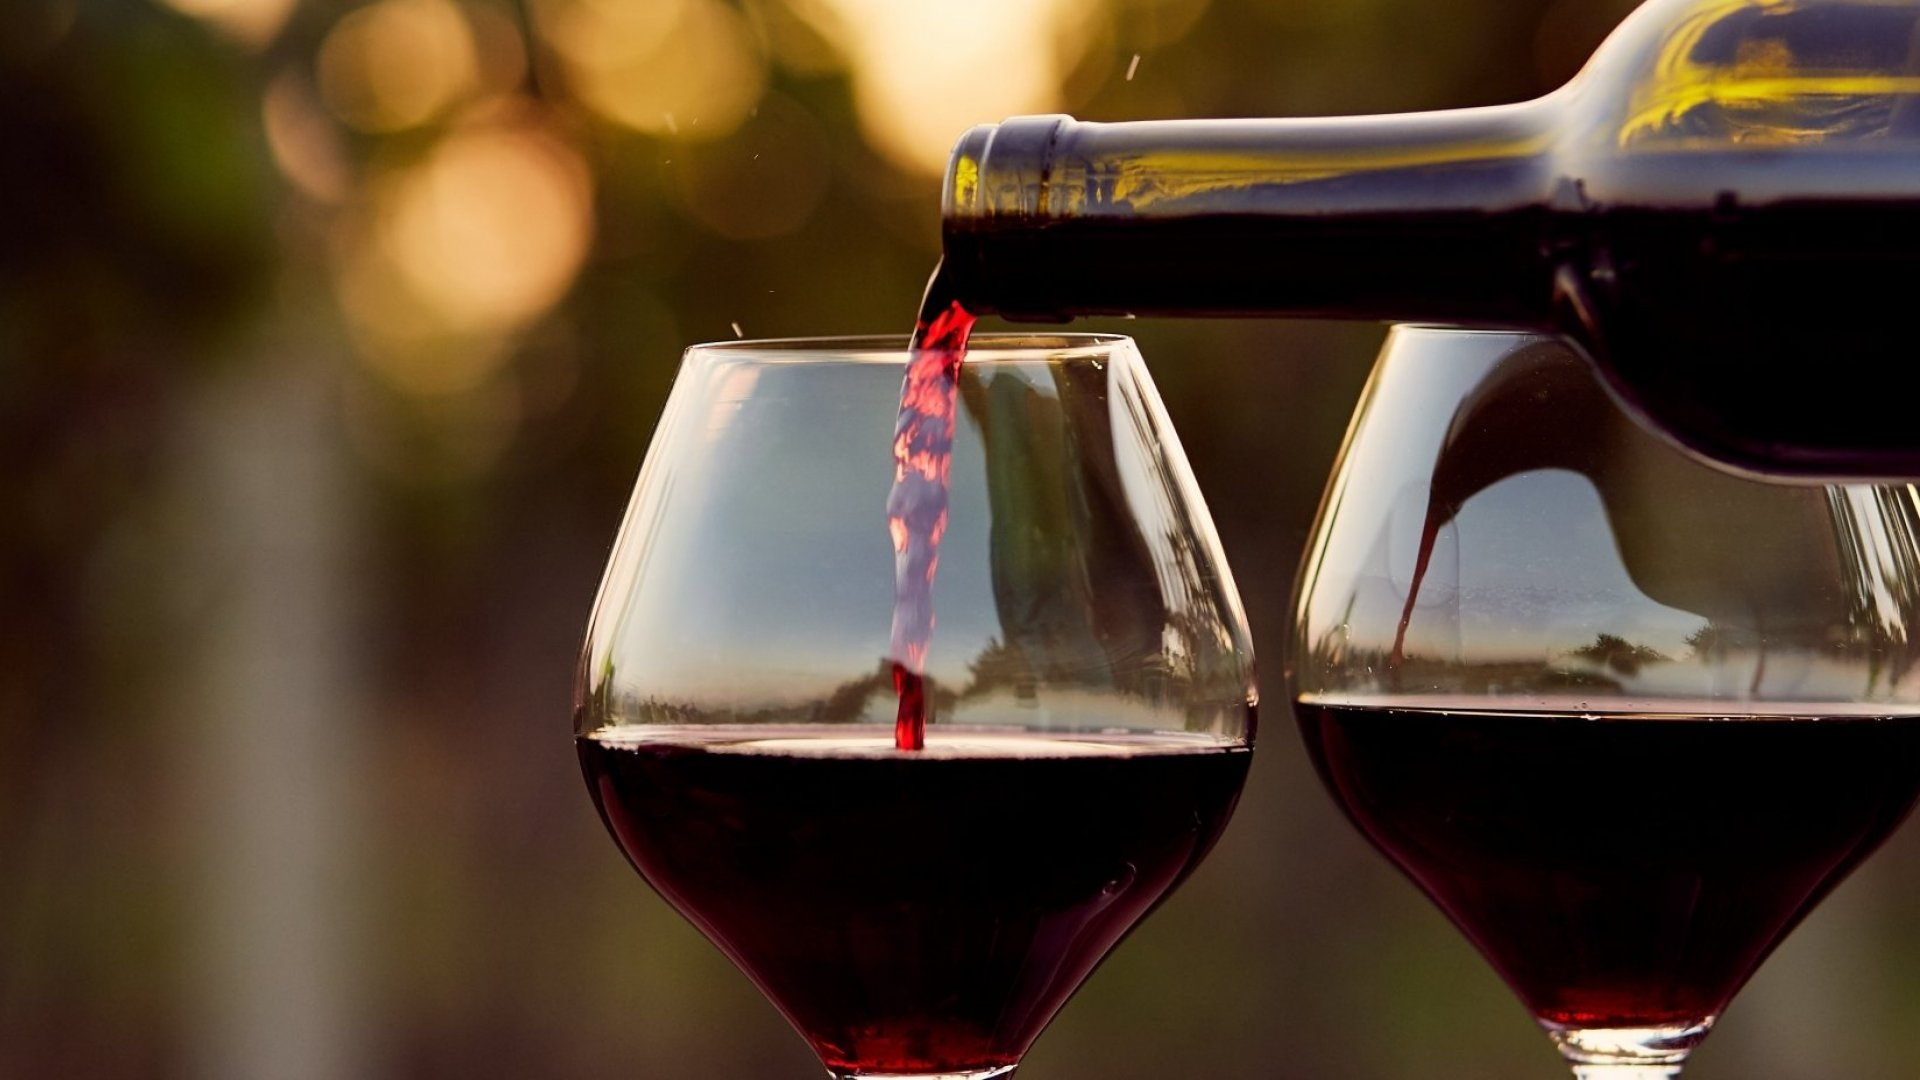 No more wine?